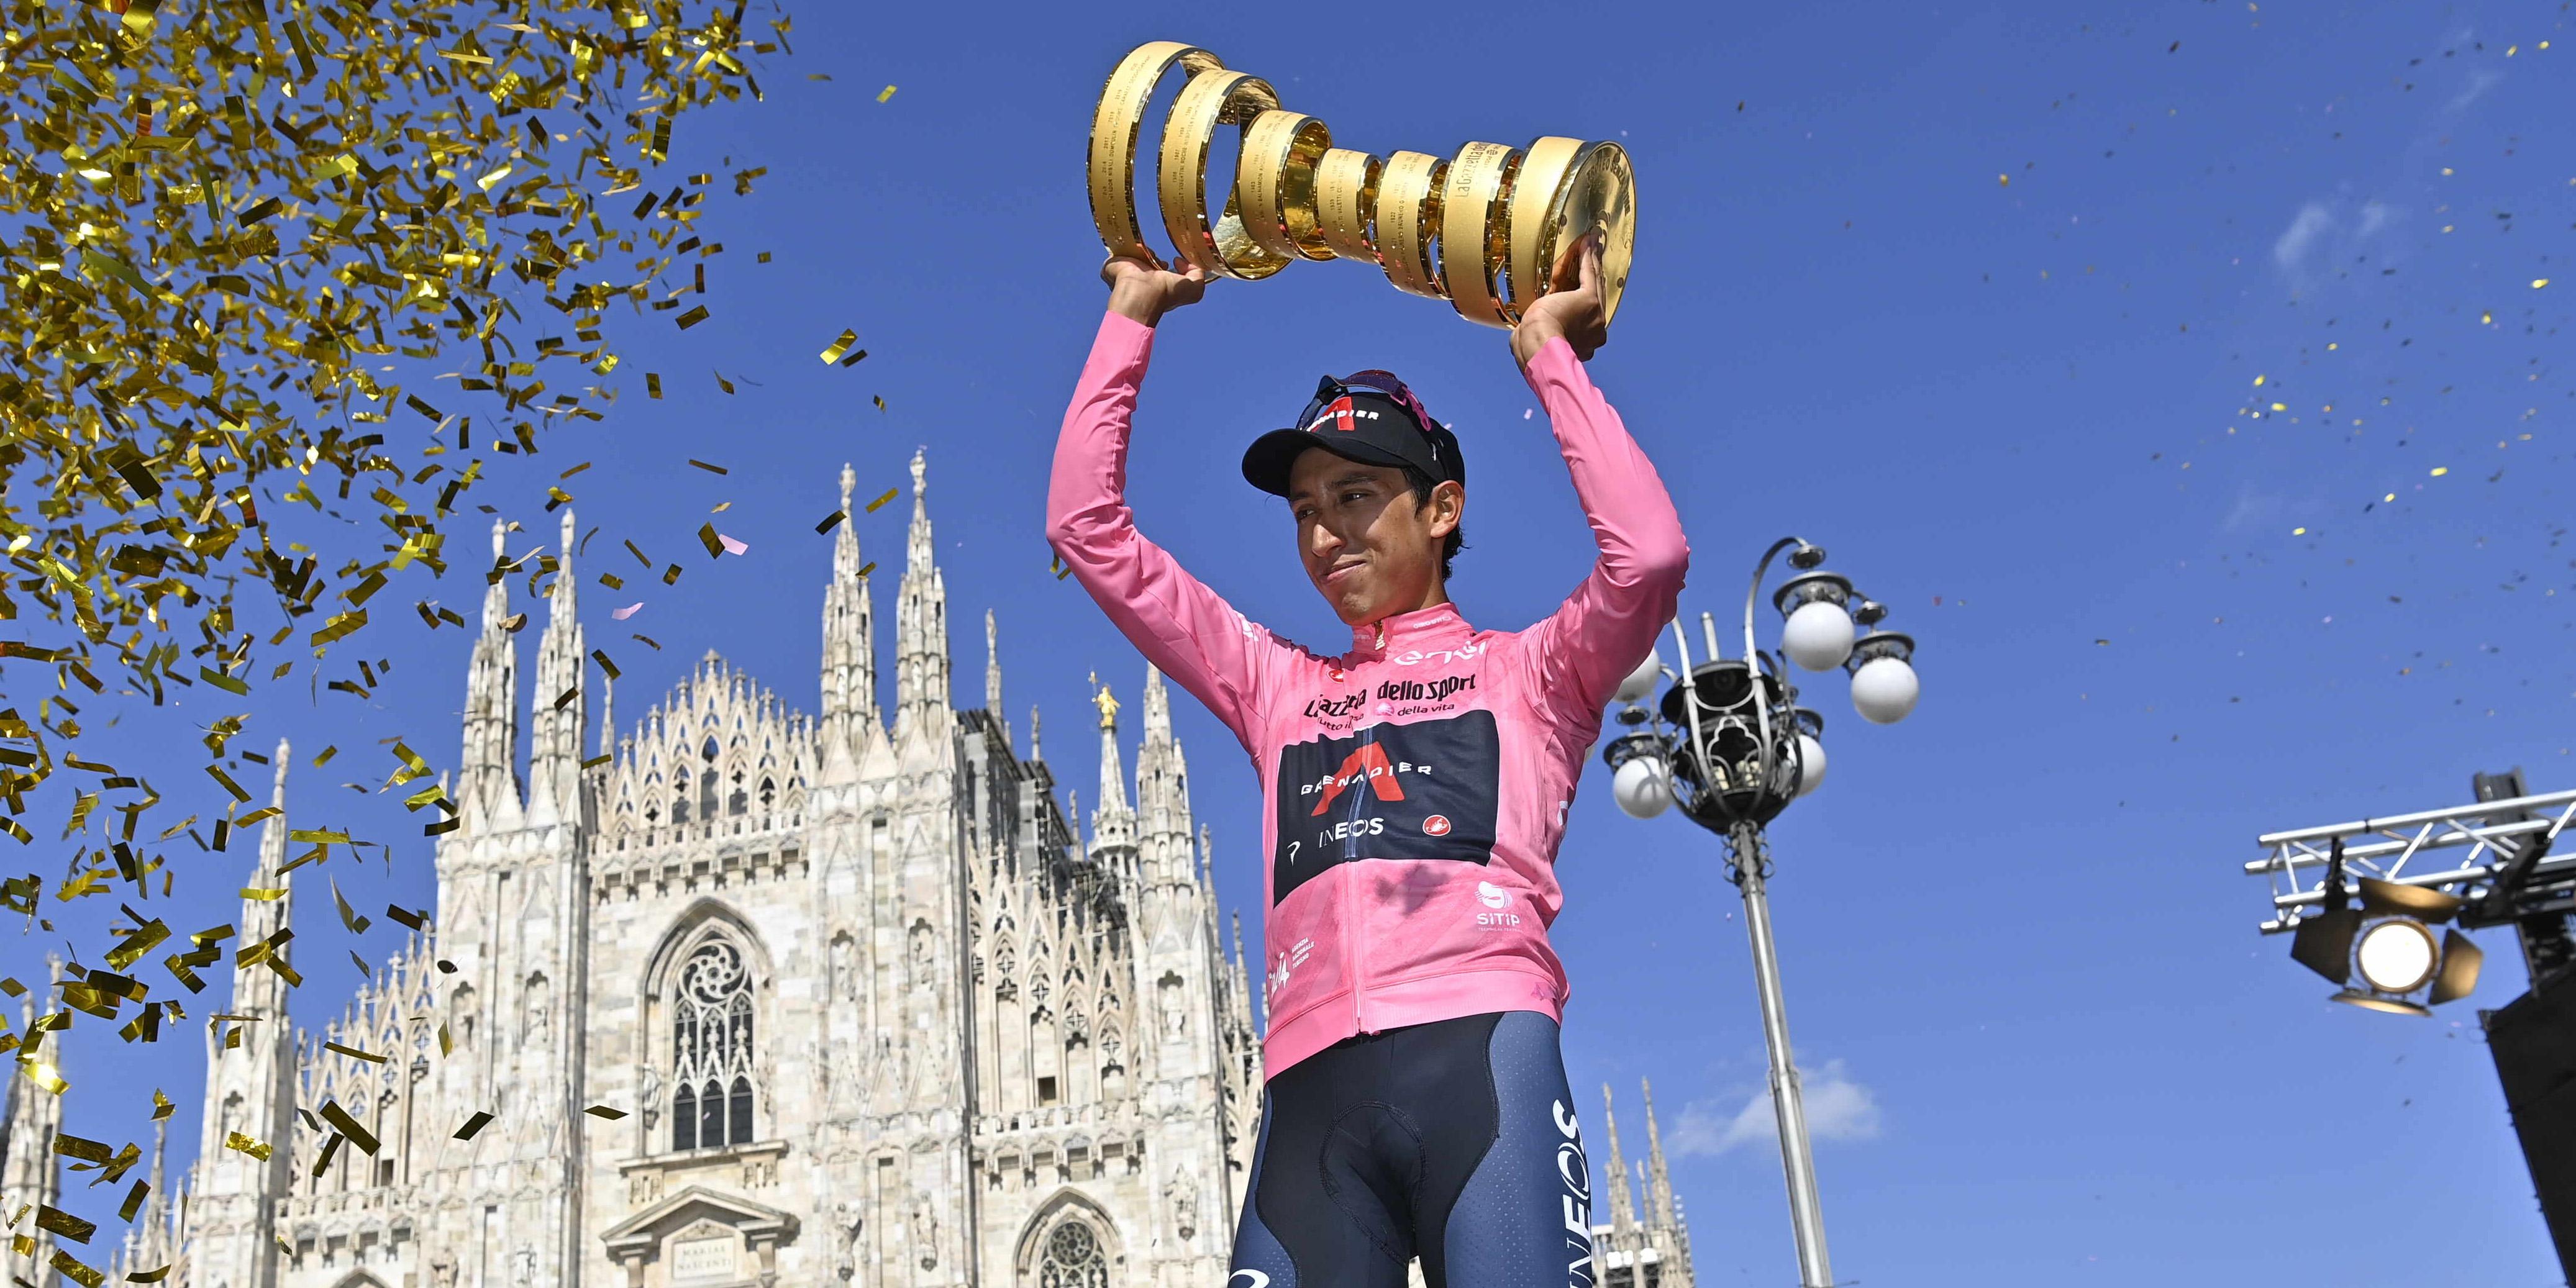 Egan Bernal, Salire a le stelle- Tappa 21 del Giro d'Italia 2021